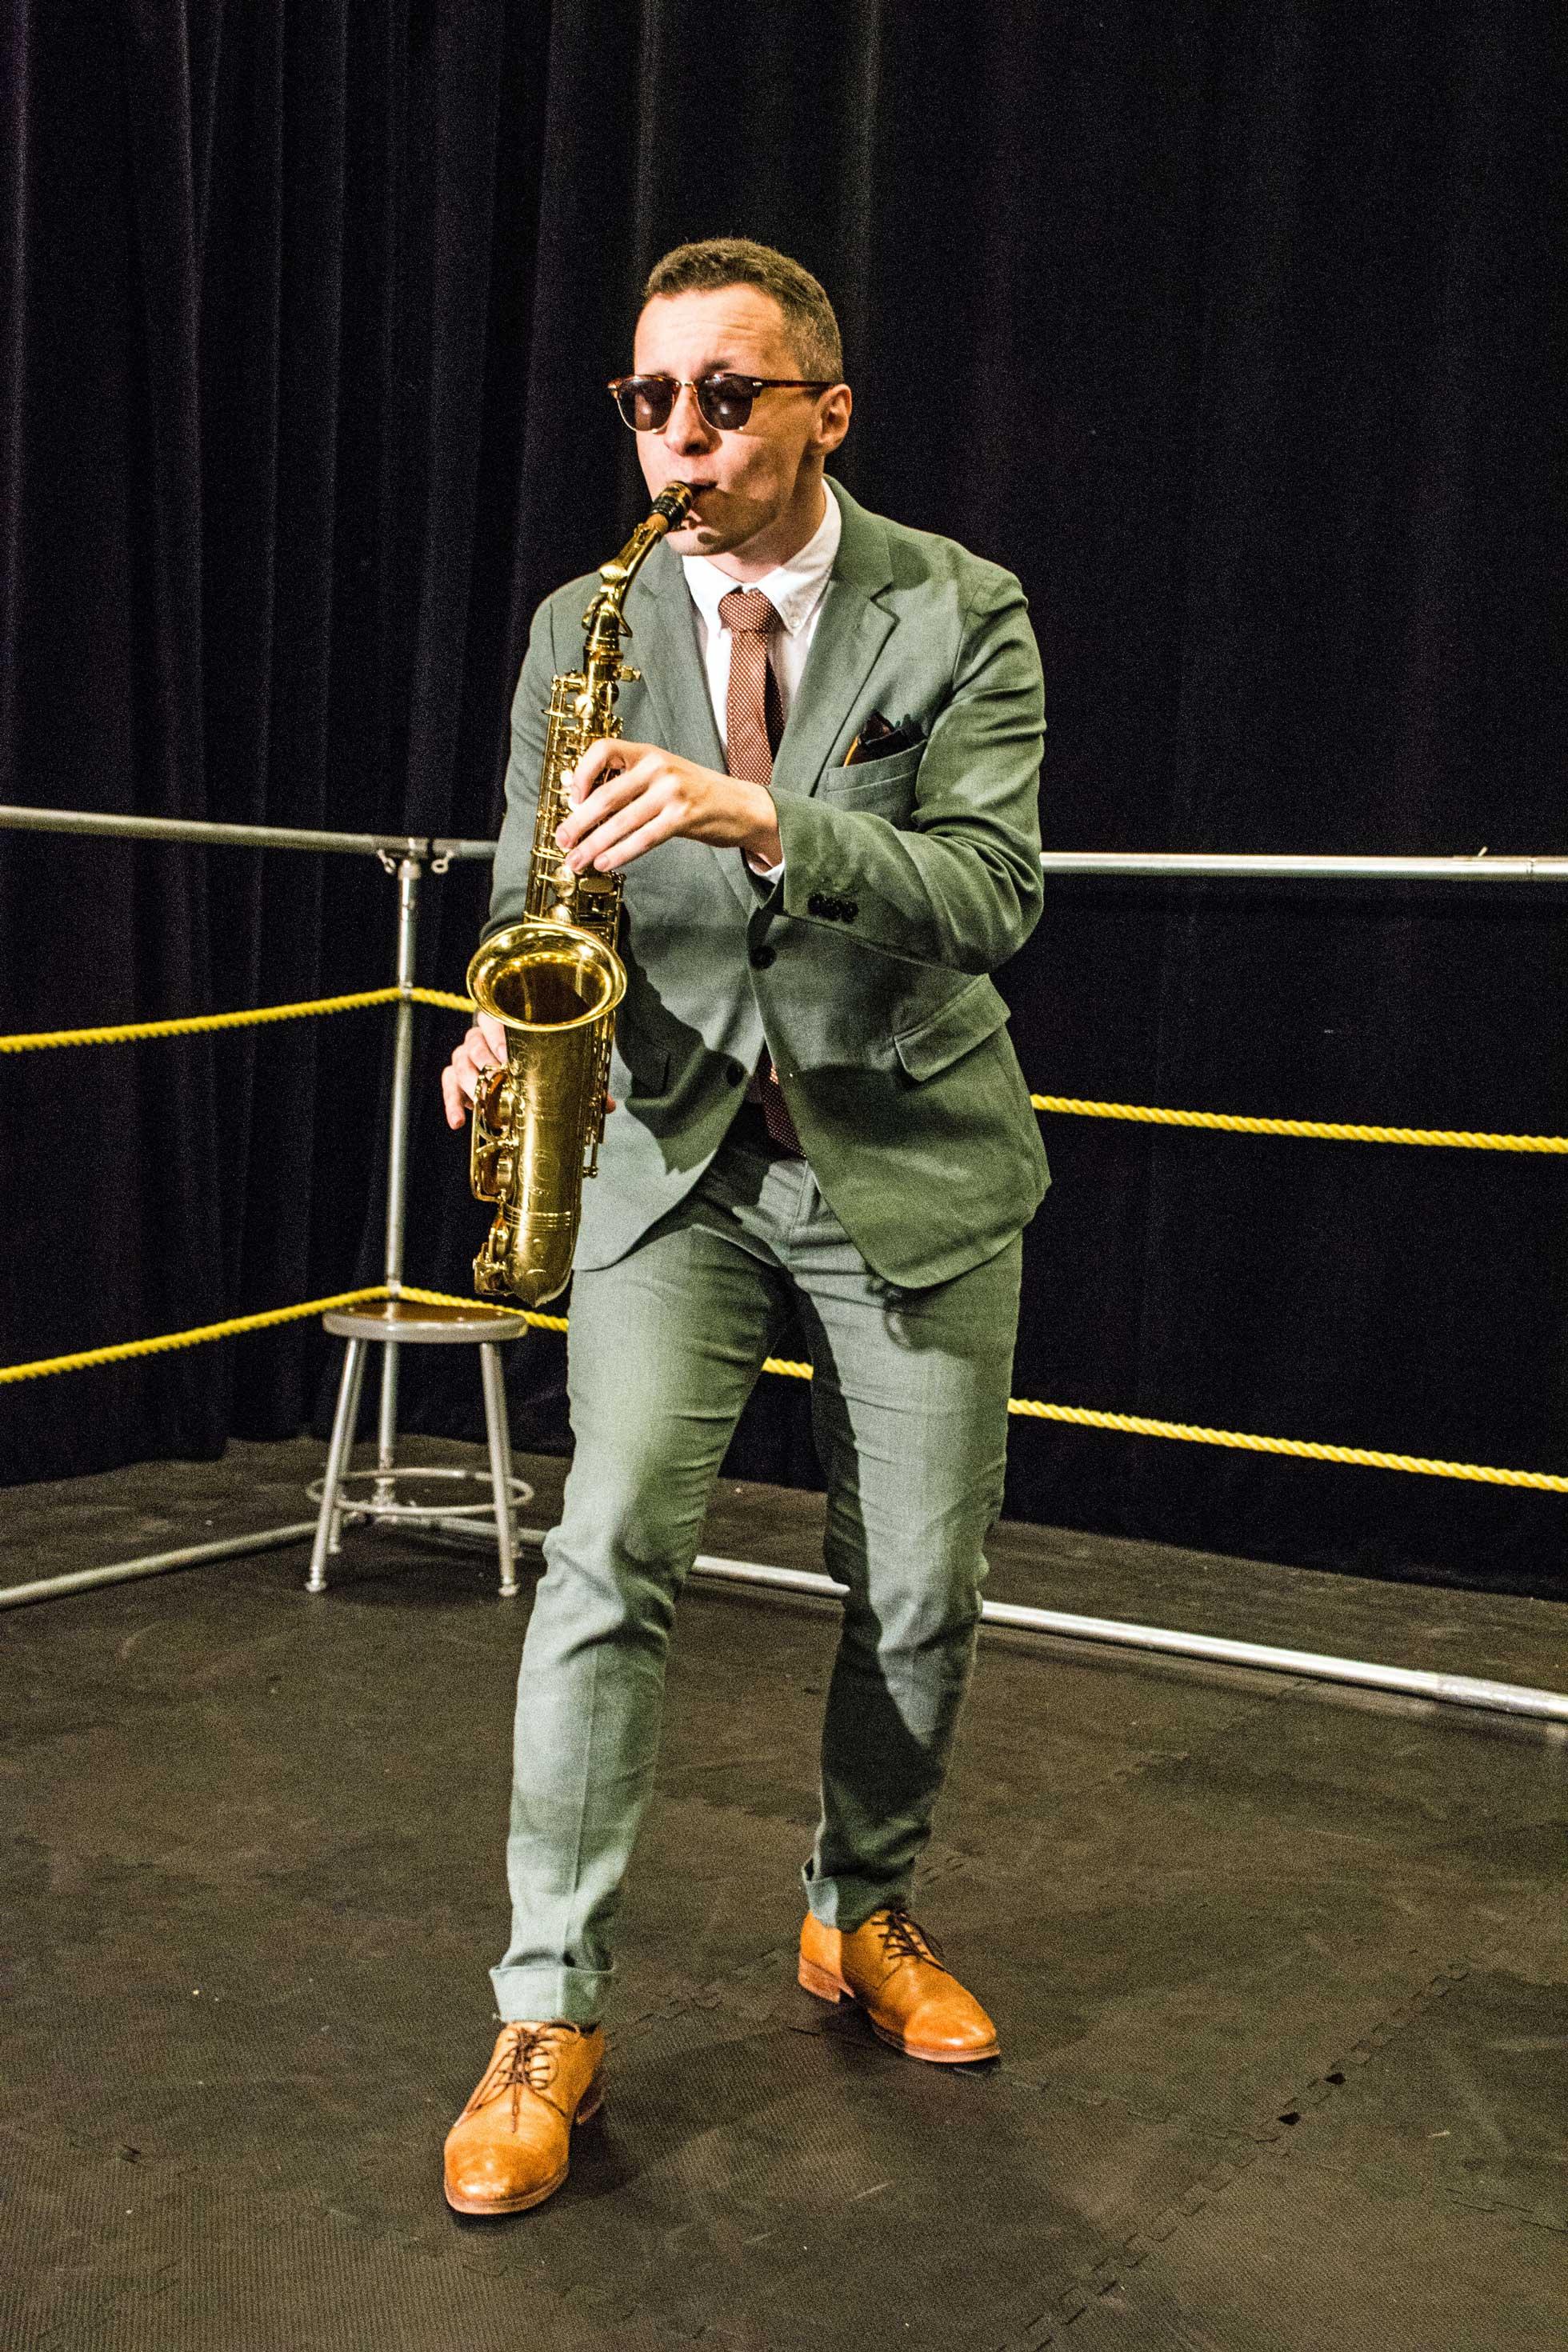 Recent KPU graduate Jay Reedy as The Jazz Man